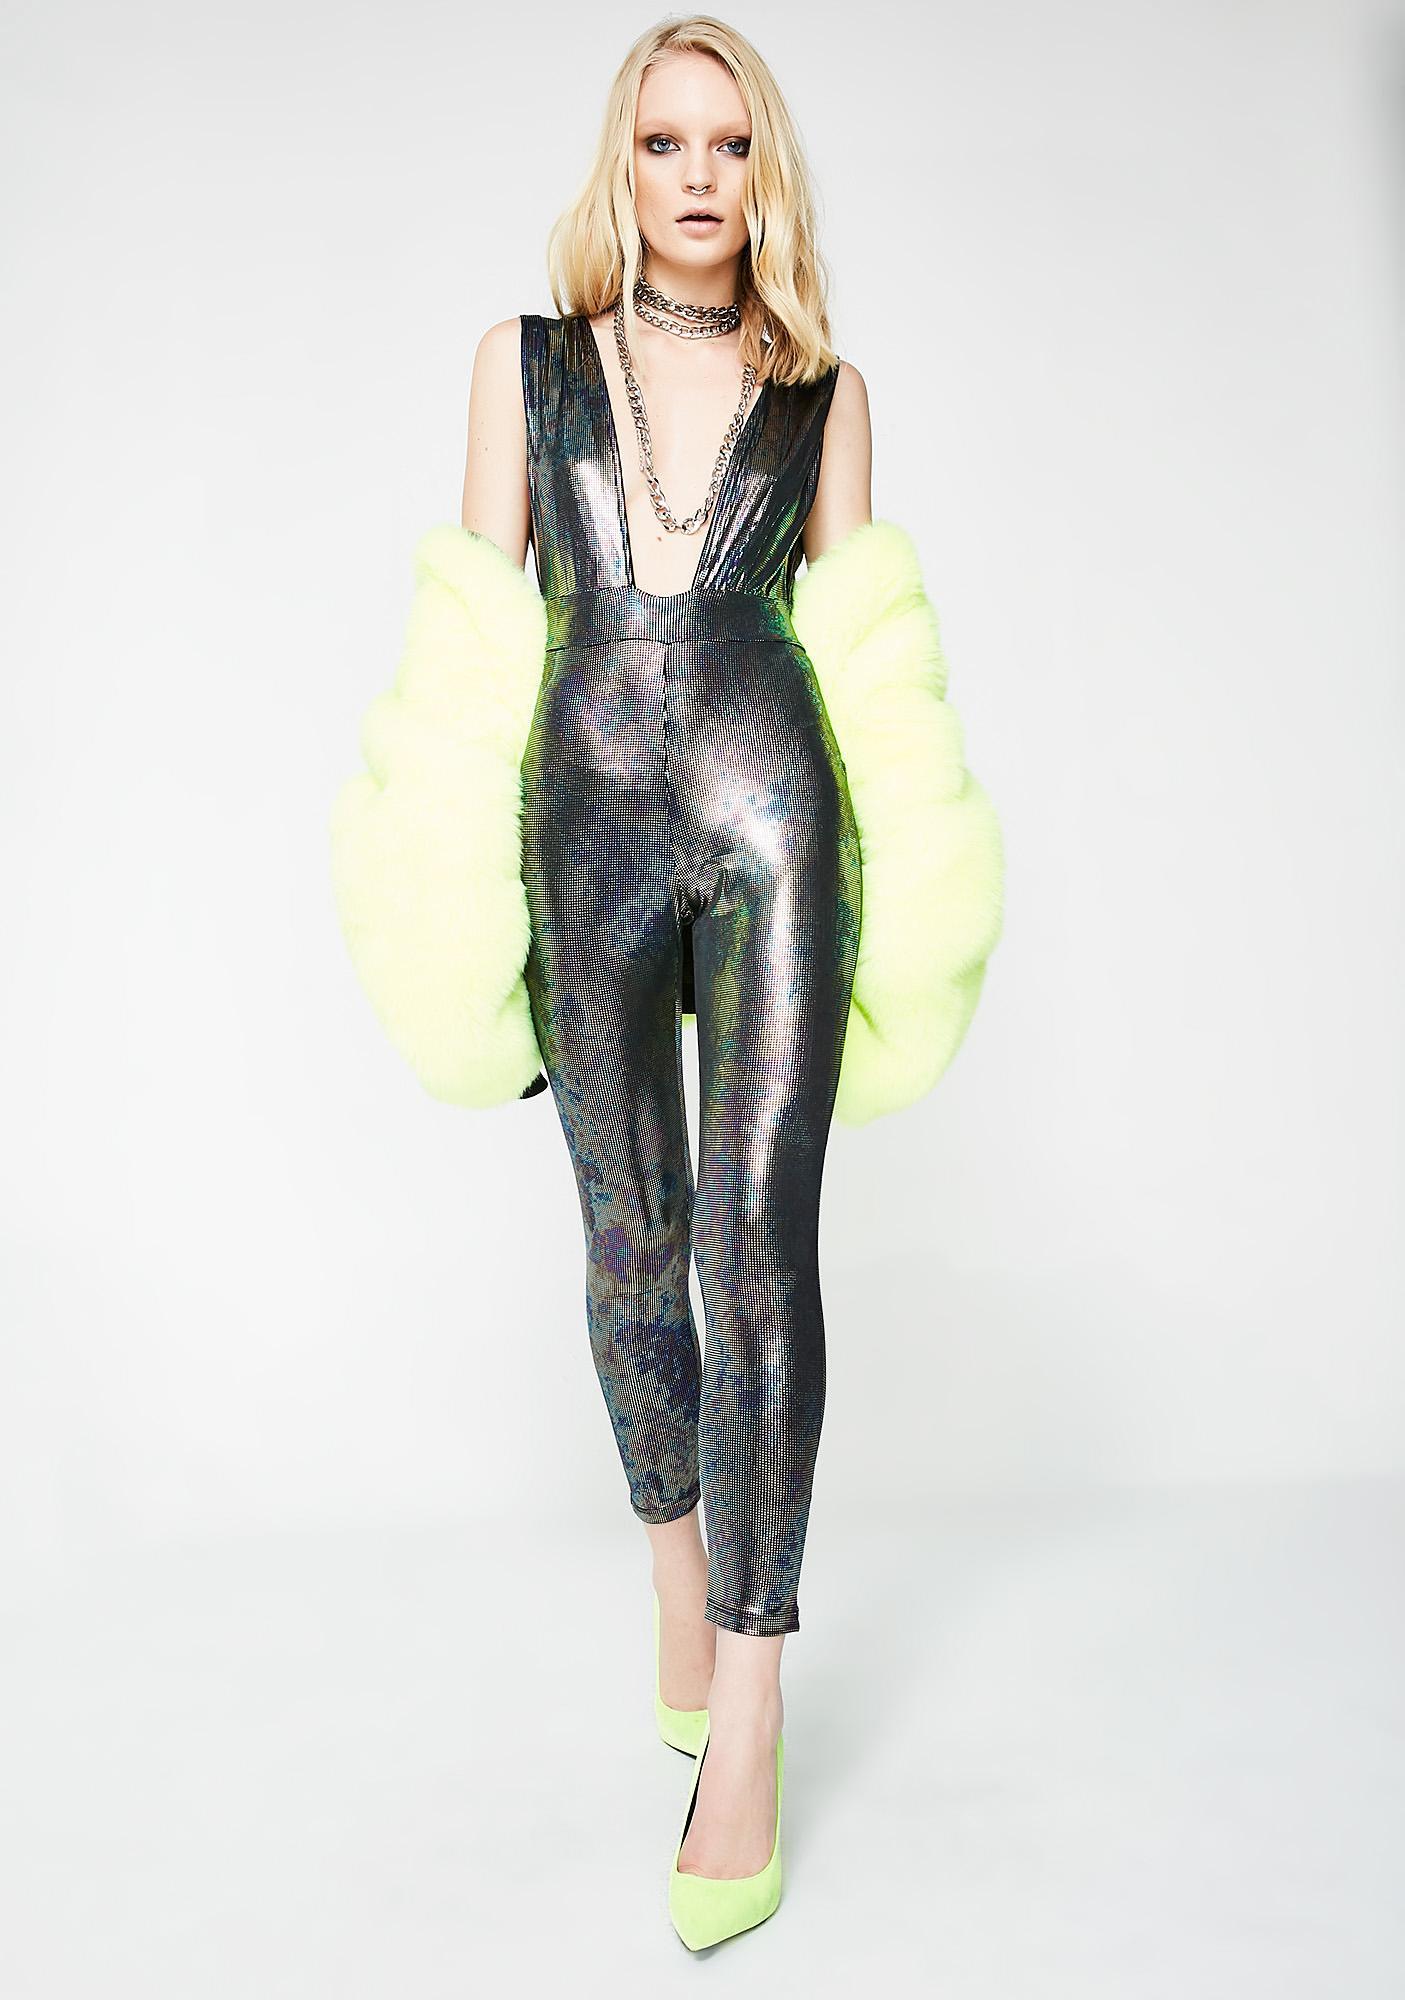 Opal Spill Bodysuit